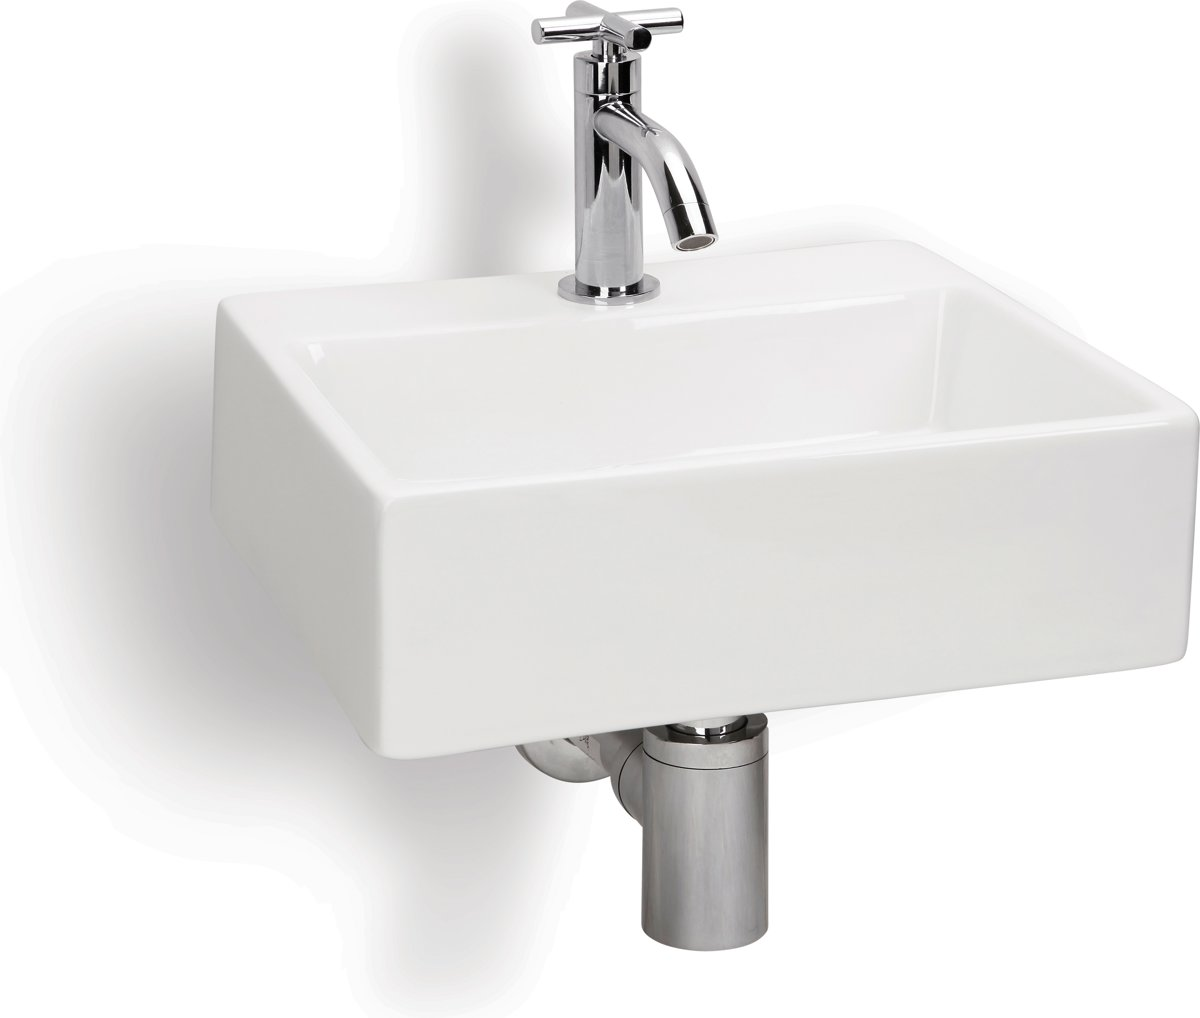 Differnz Argus Fontein Toilet - Set - Fontein 33 x 28,5 cm inclusief fonteinkraan en sifon - Keramiek - Wit kopen